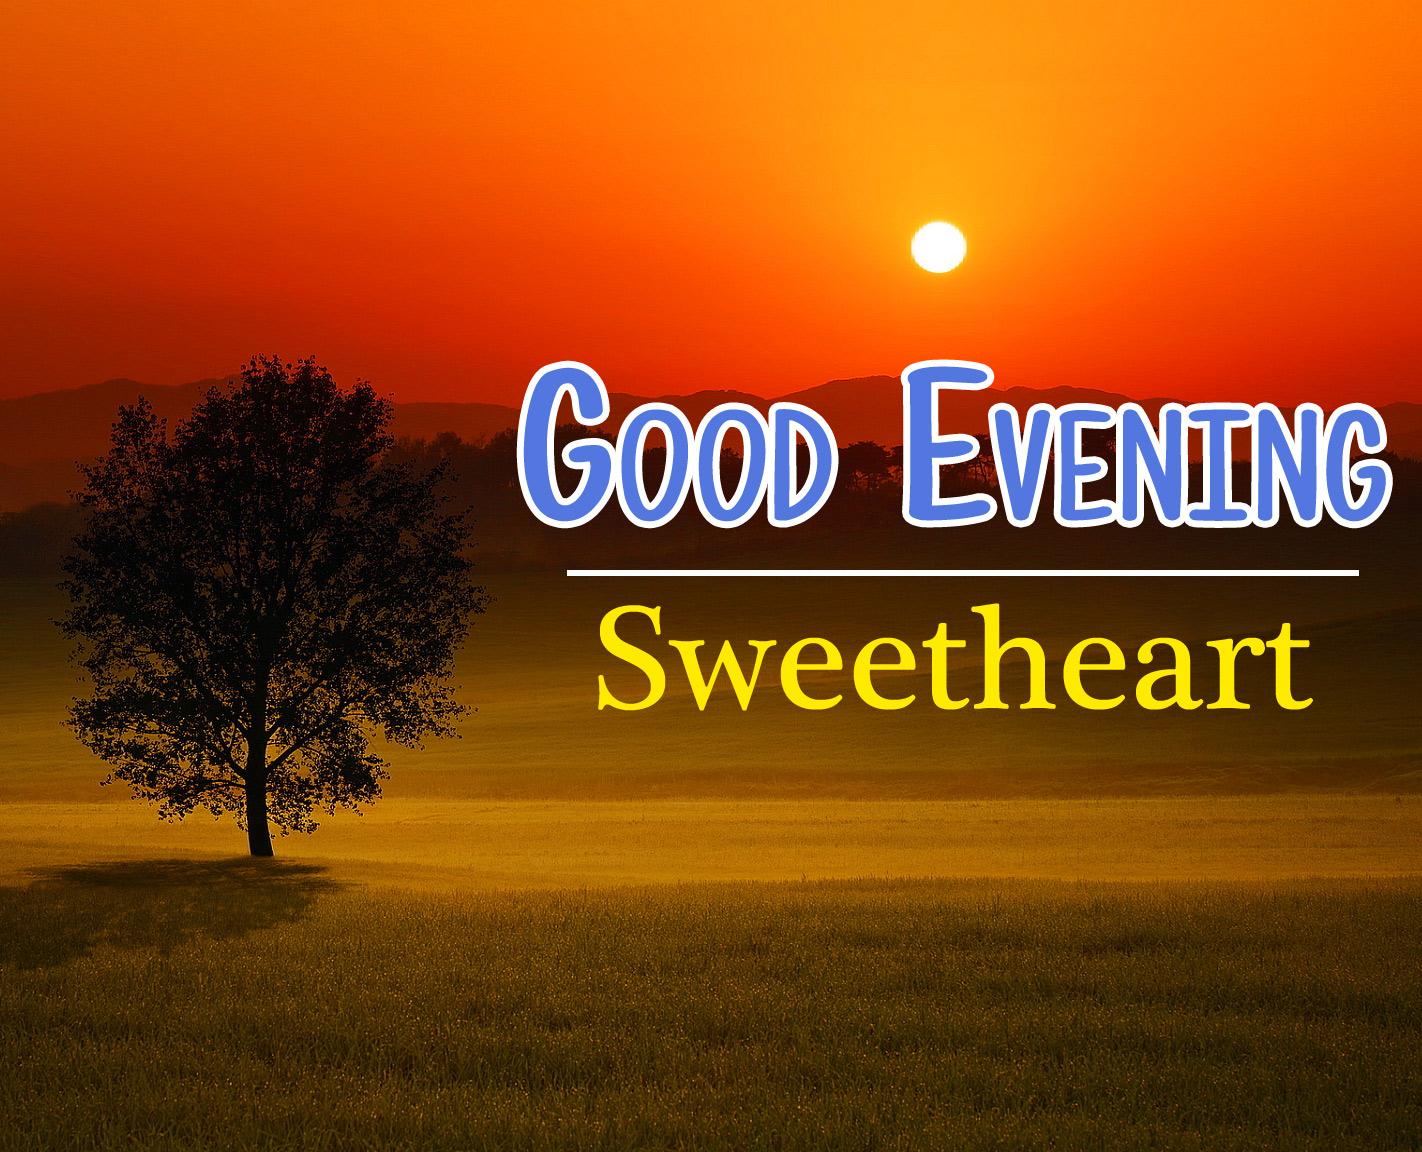 good evening photo 3